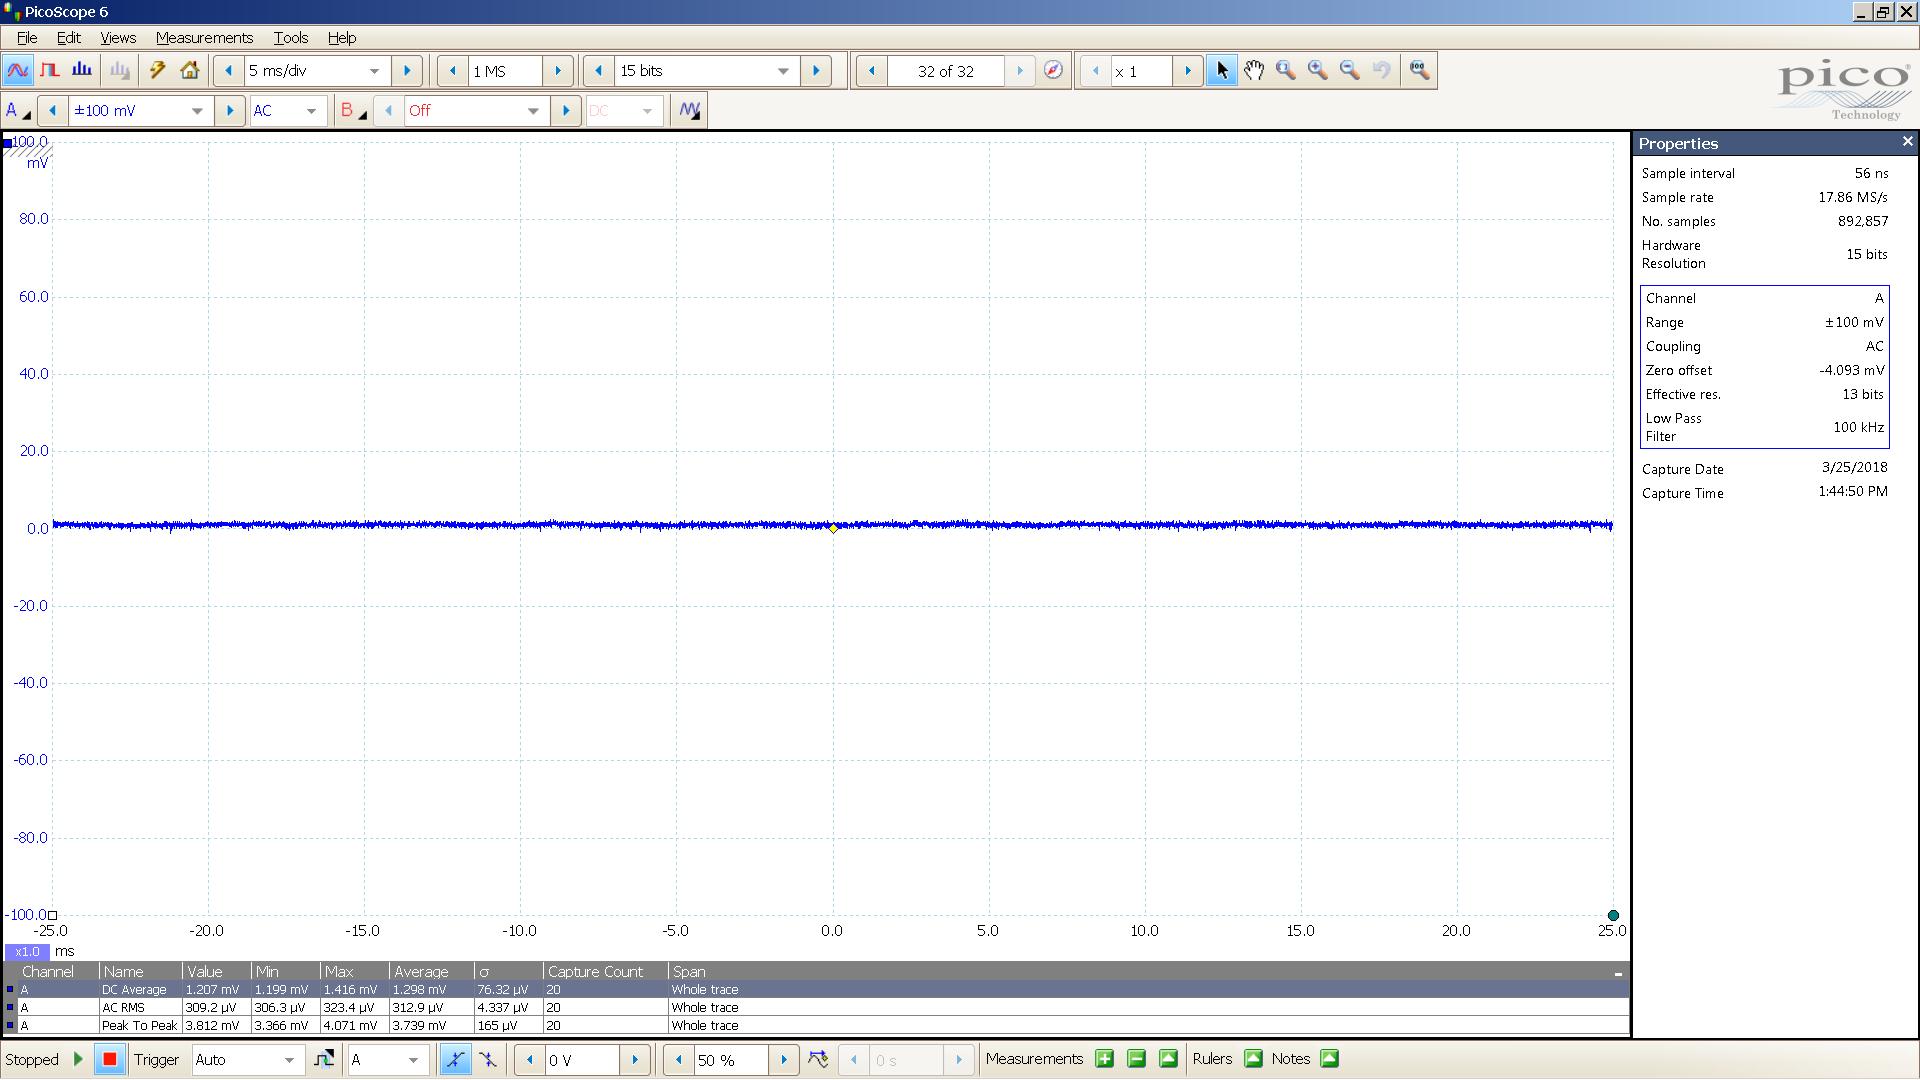 20180325 BK Precision 1627A 28V 56R load 20mV 5mS div 100KHz.png